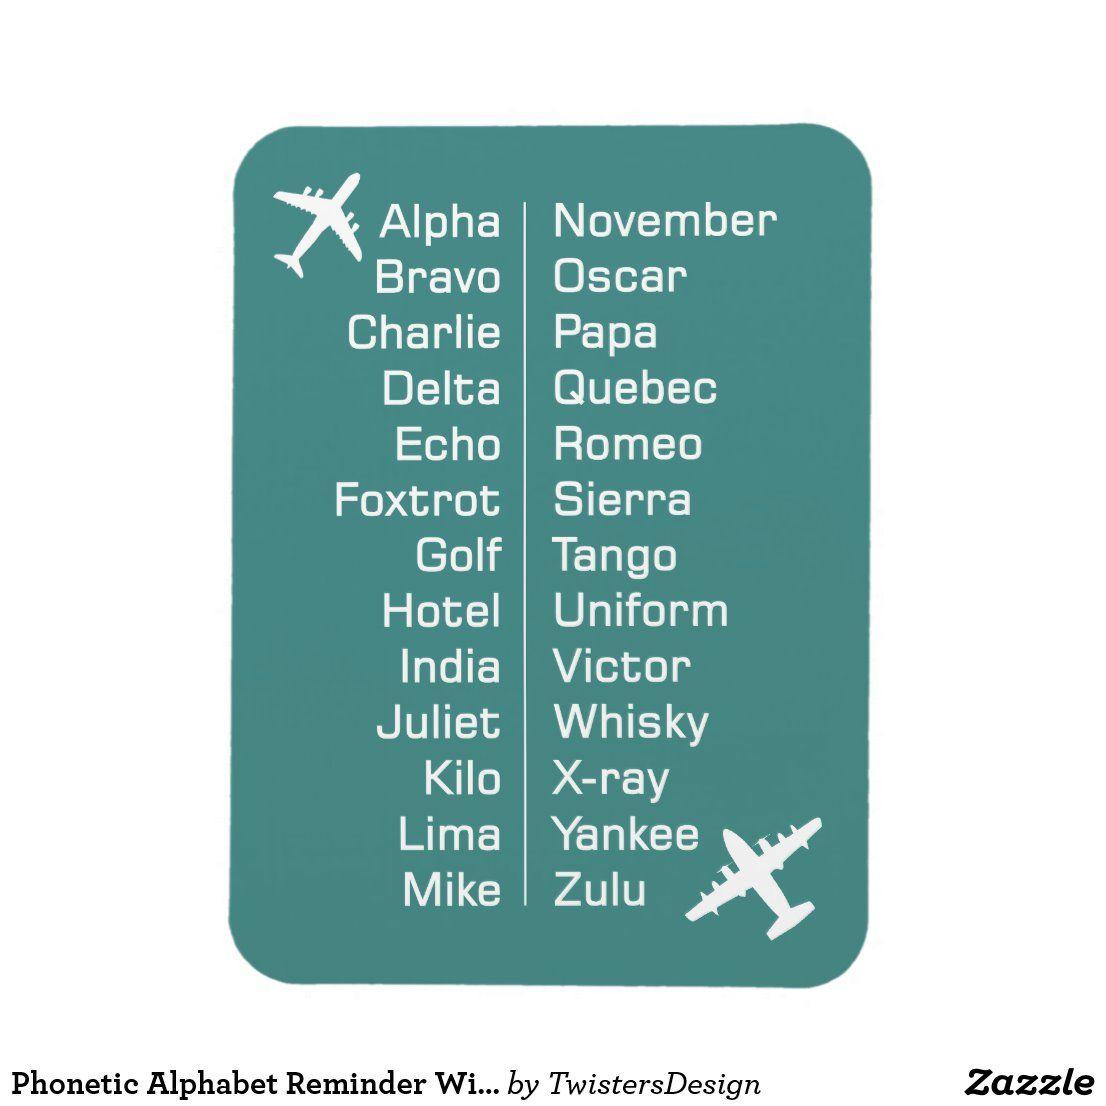 Phonetic Alphabet Reminder With Aeroplanes Magnet Zazzle Com Phonetic Alphabet Reminder Alphabet